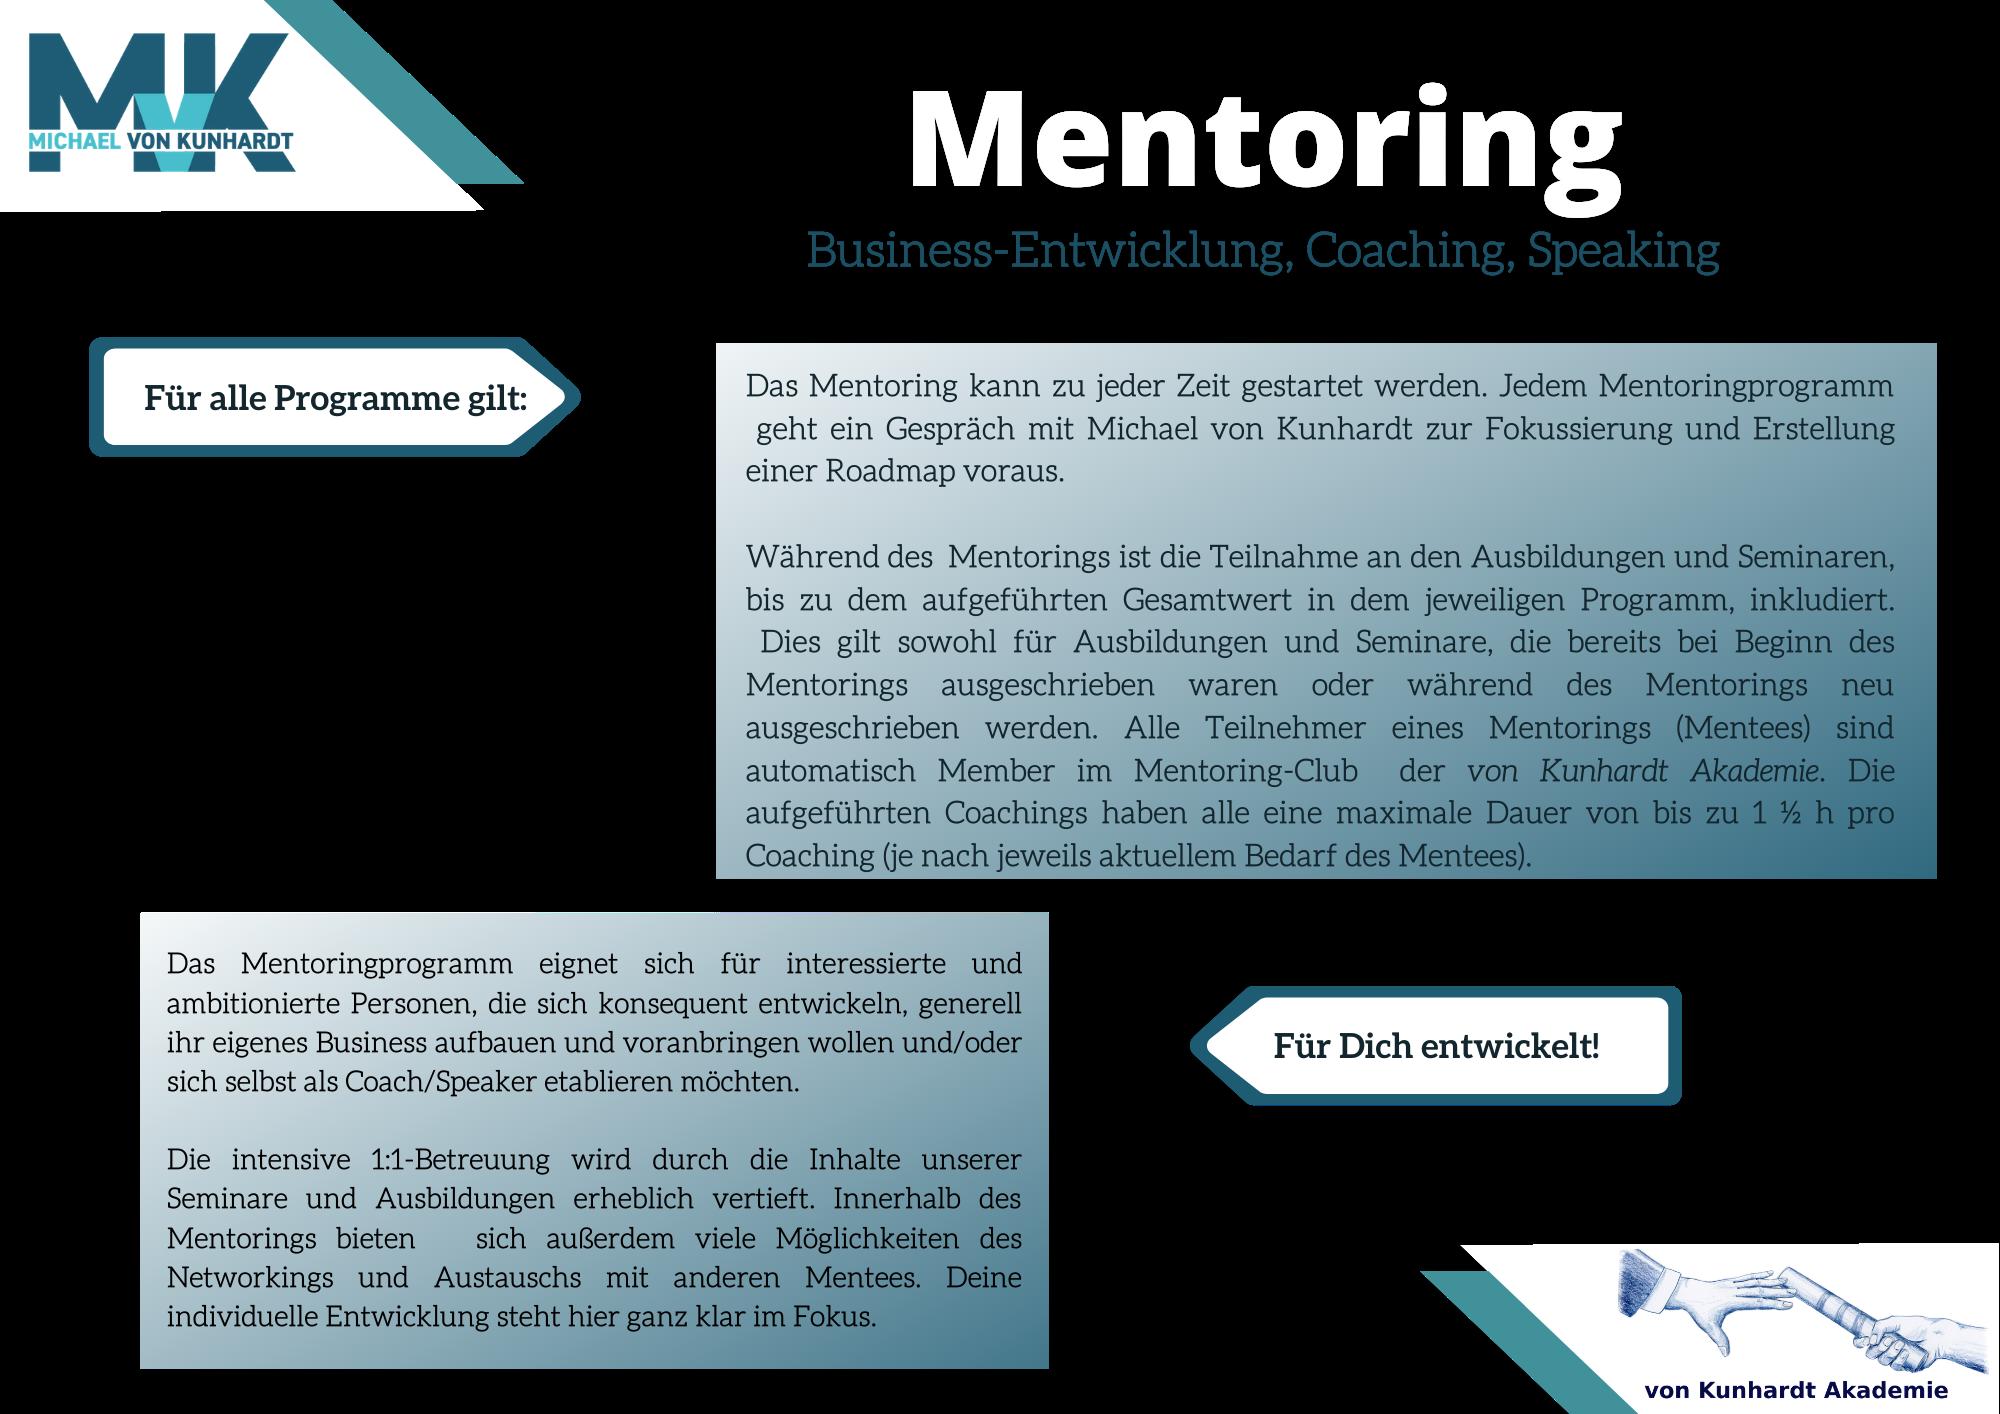 https://www.vonkunhardt.de/wp-content/uploads/2021/02/Mentoring-Programm-3-2000x1414.png